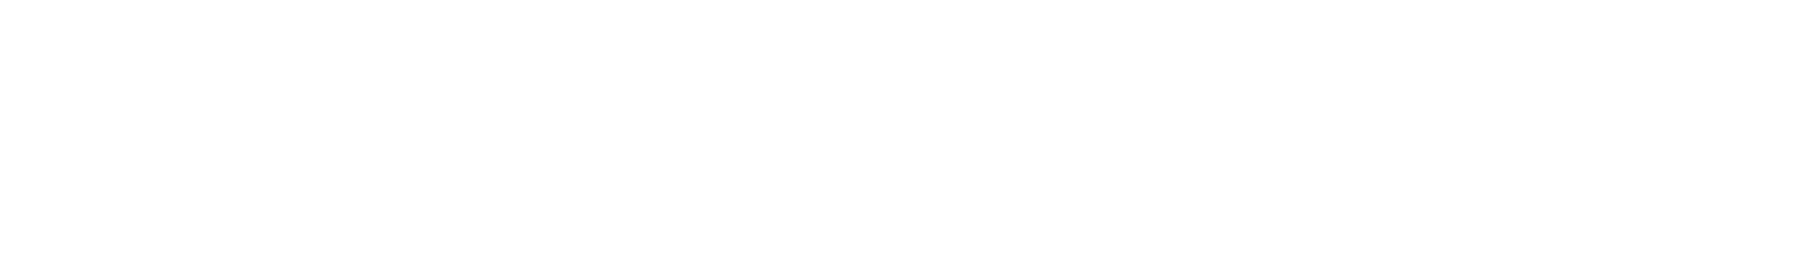 bassy synth 125